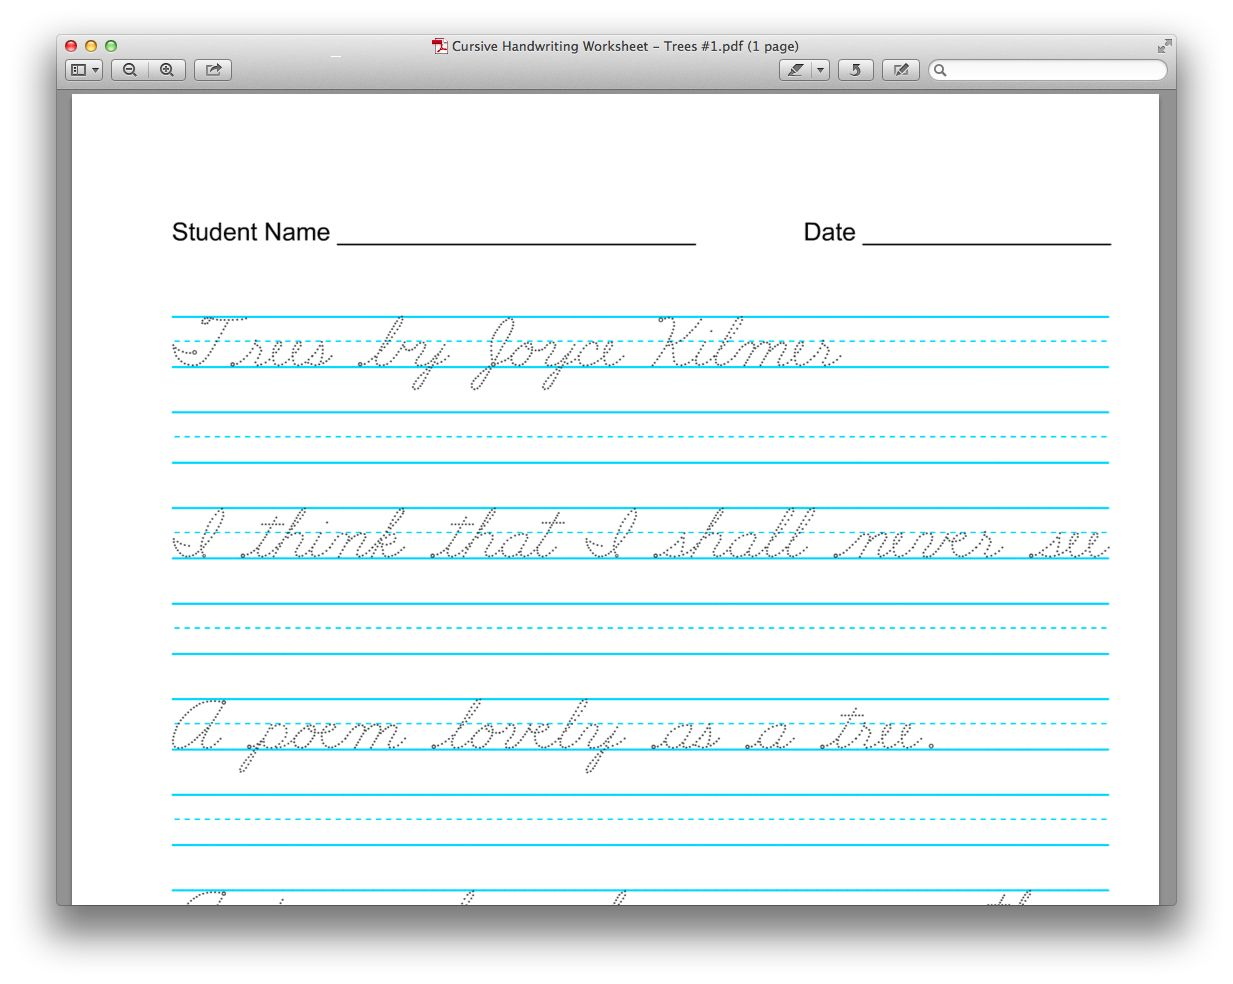 Useful And Free Resource Customize Your Copywork Copywork Handwriting Worksheet Maker Handwriting Worksheets